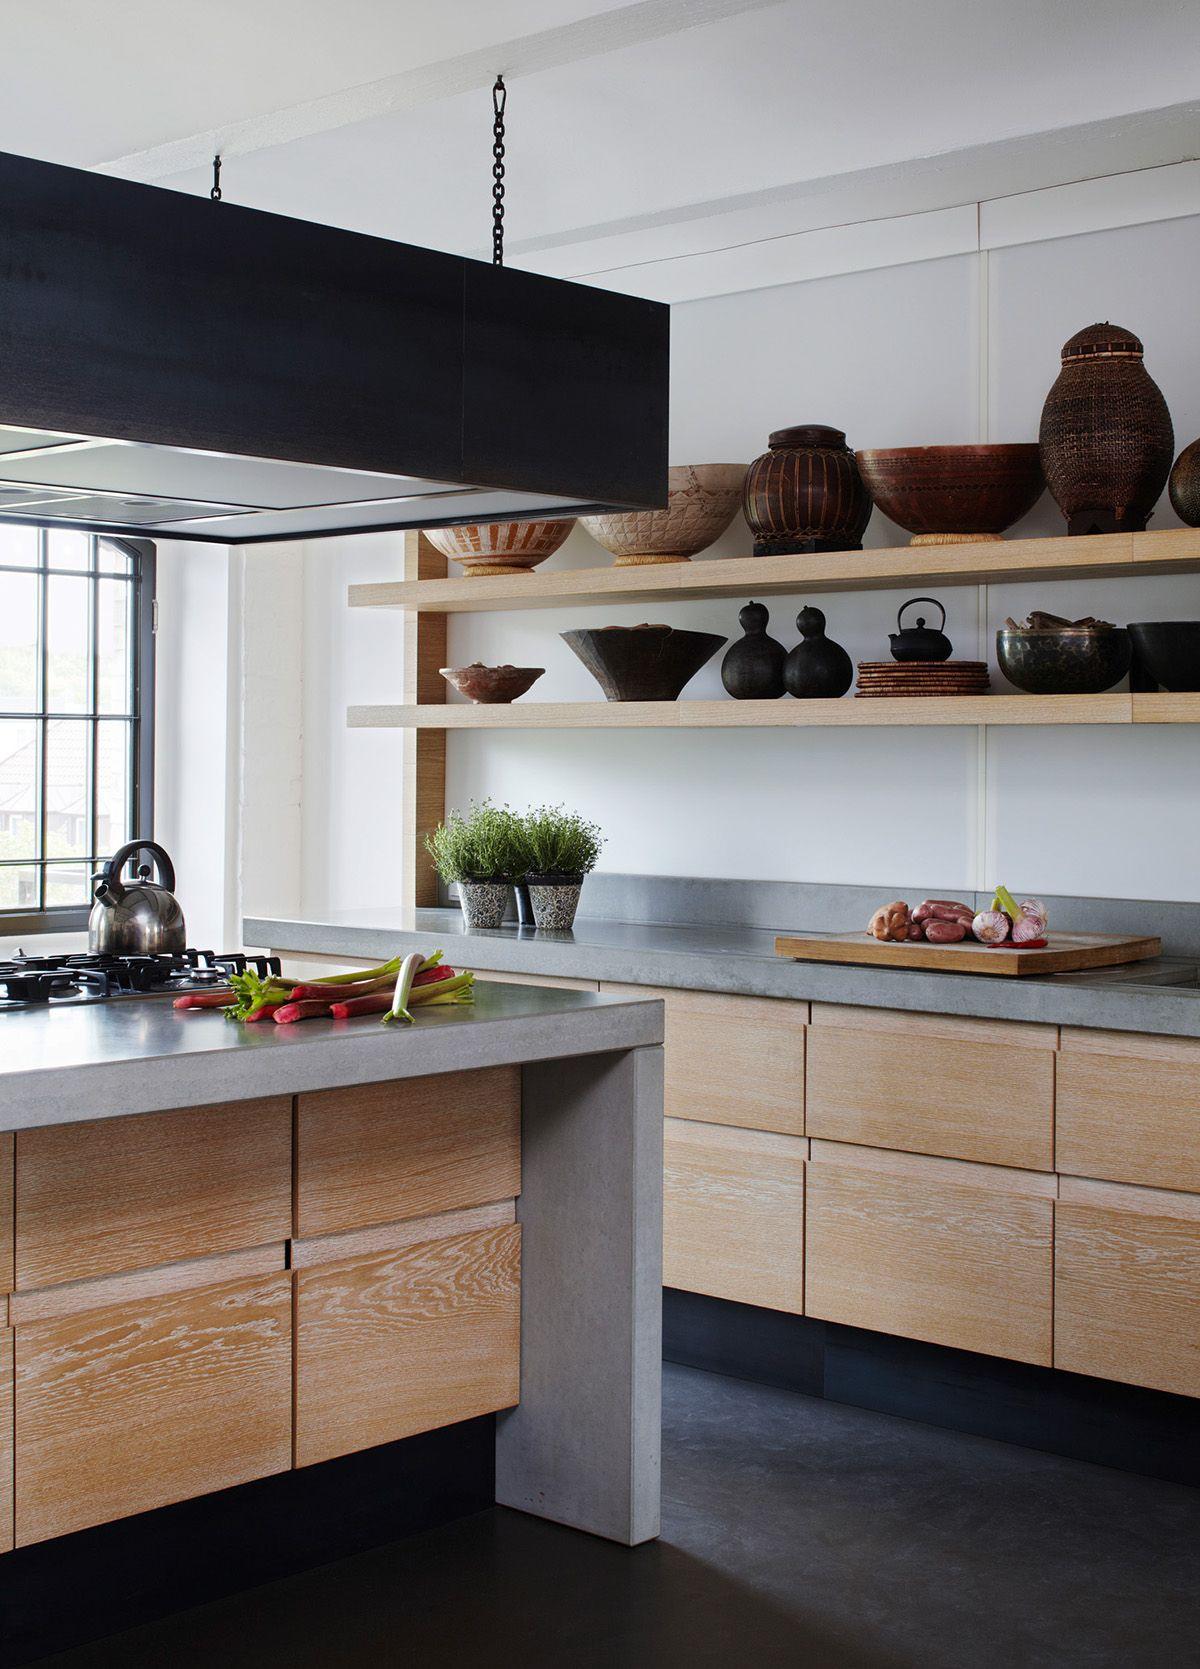 Private Apartment Berlin Annabell Kutucu | .cooking | Pinterest ...